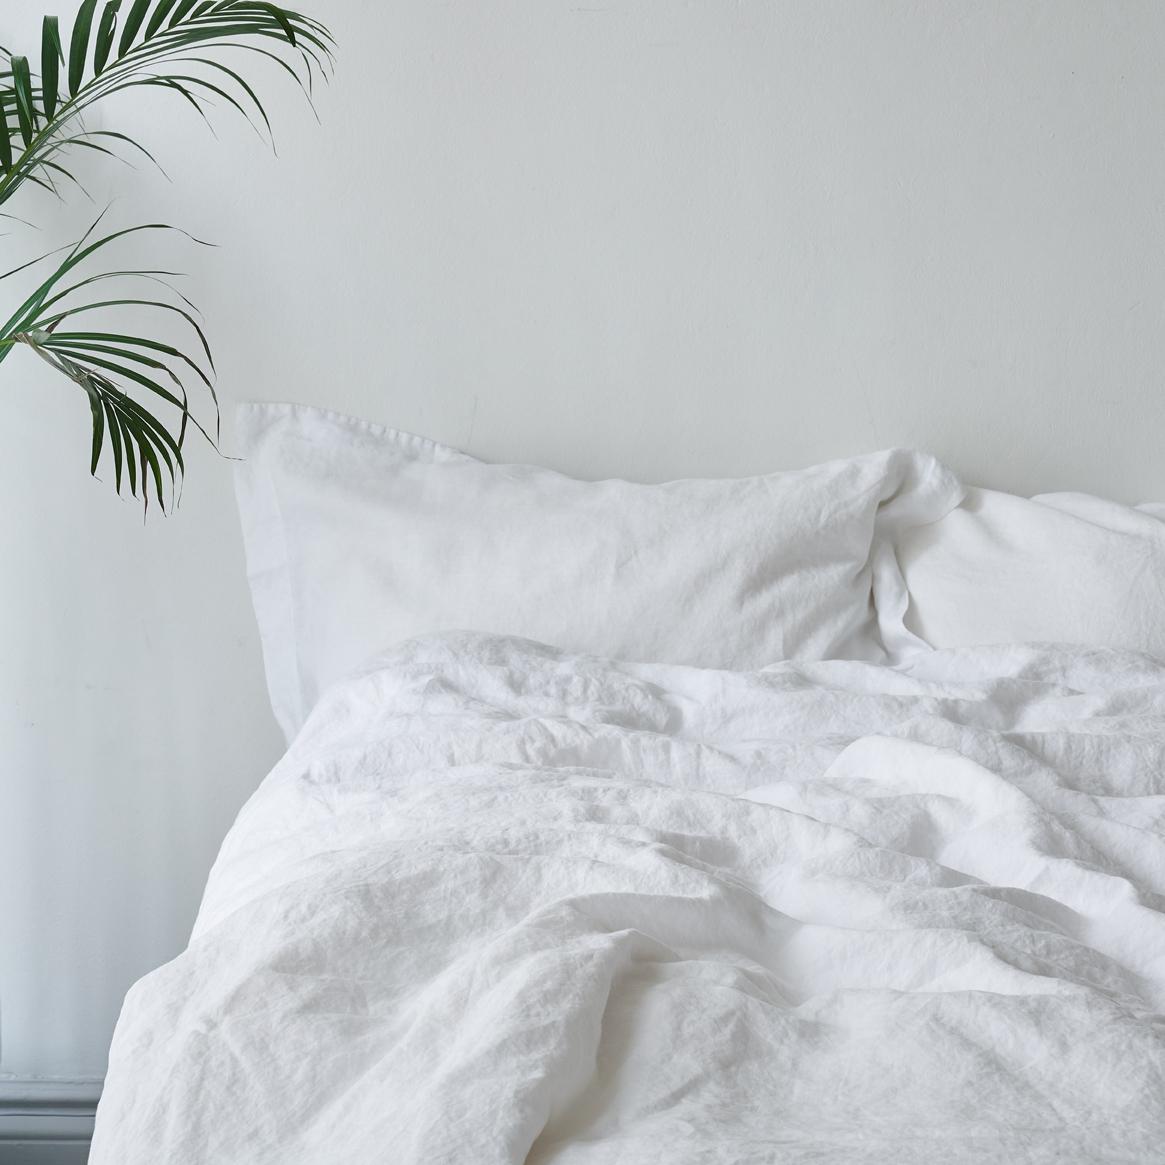 linen bedding 이미지 검색결과